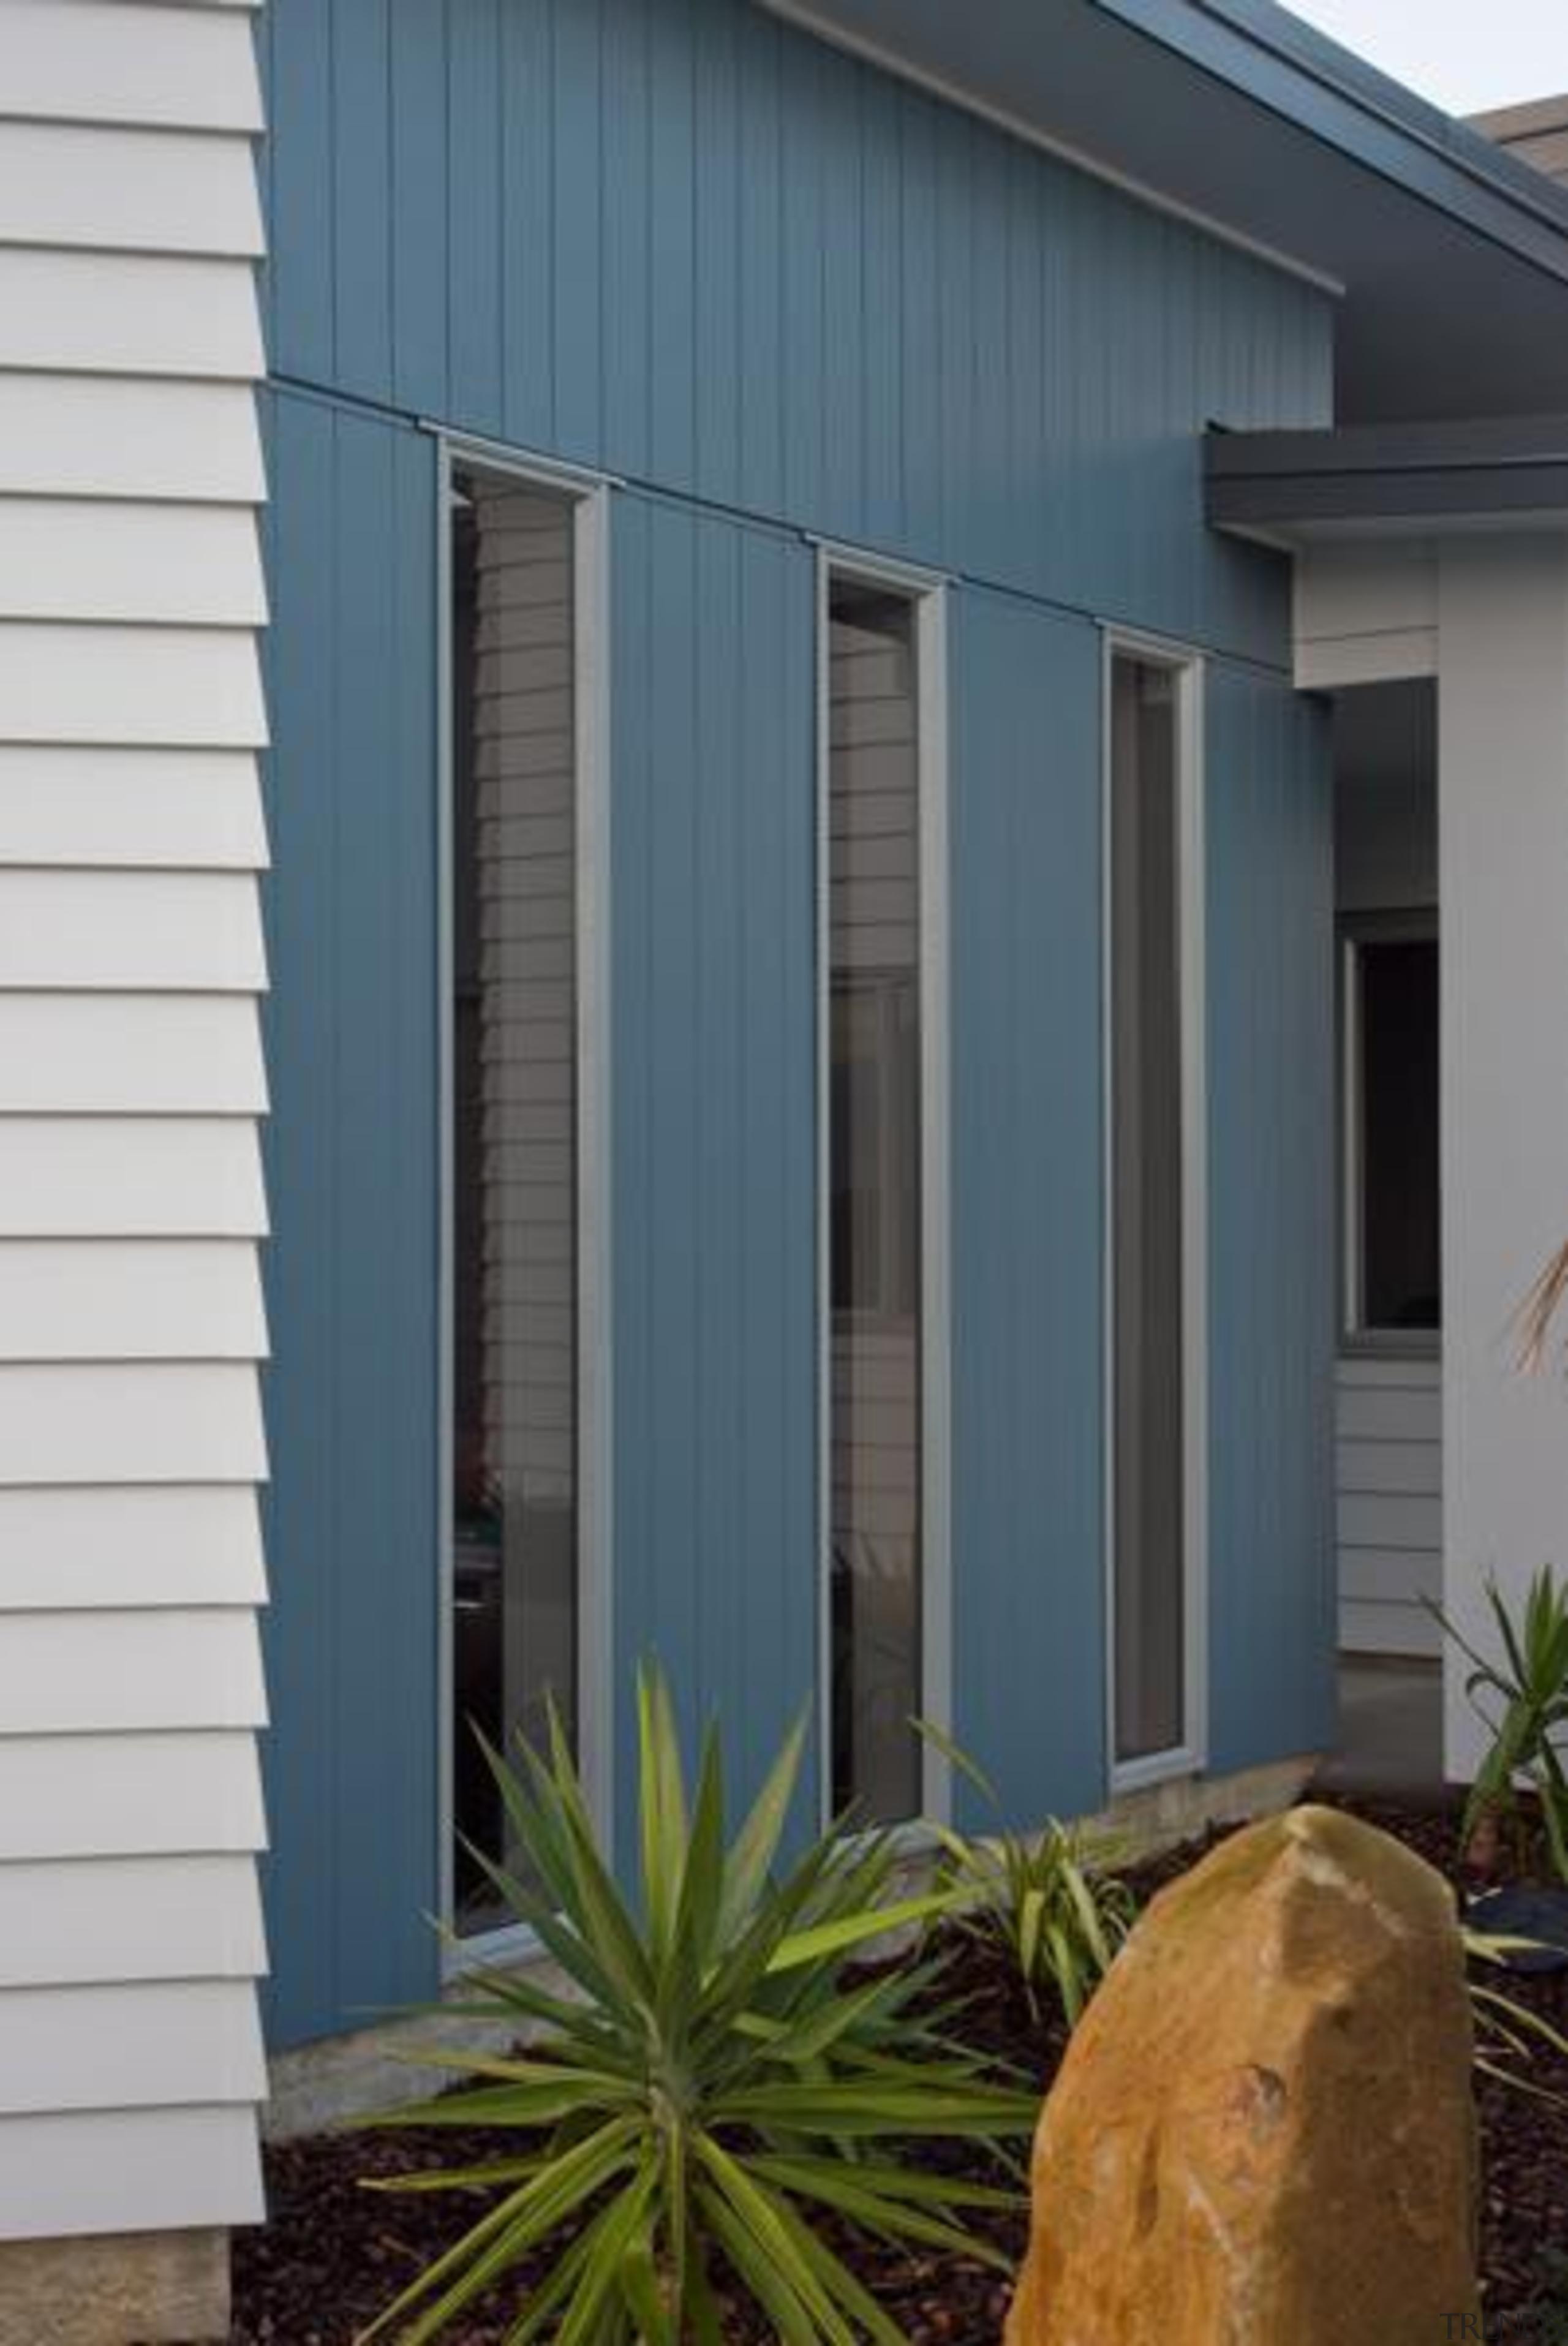 Axon Panel - Axon Panel - door | door, facade, home, house, property, real estate, siding, structure, window, teal